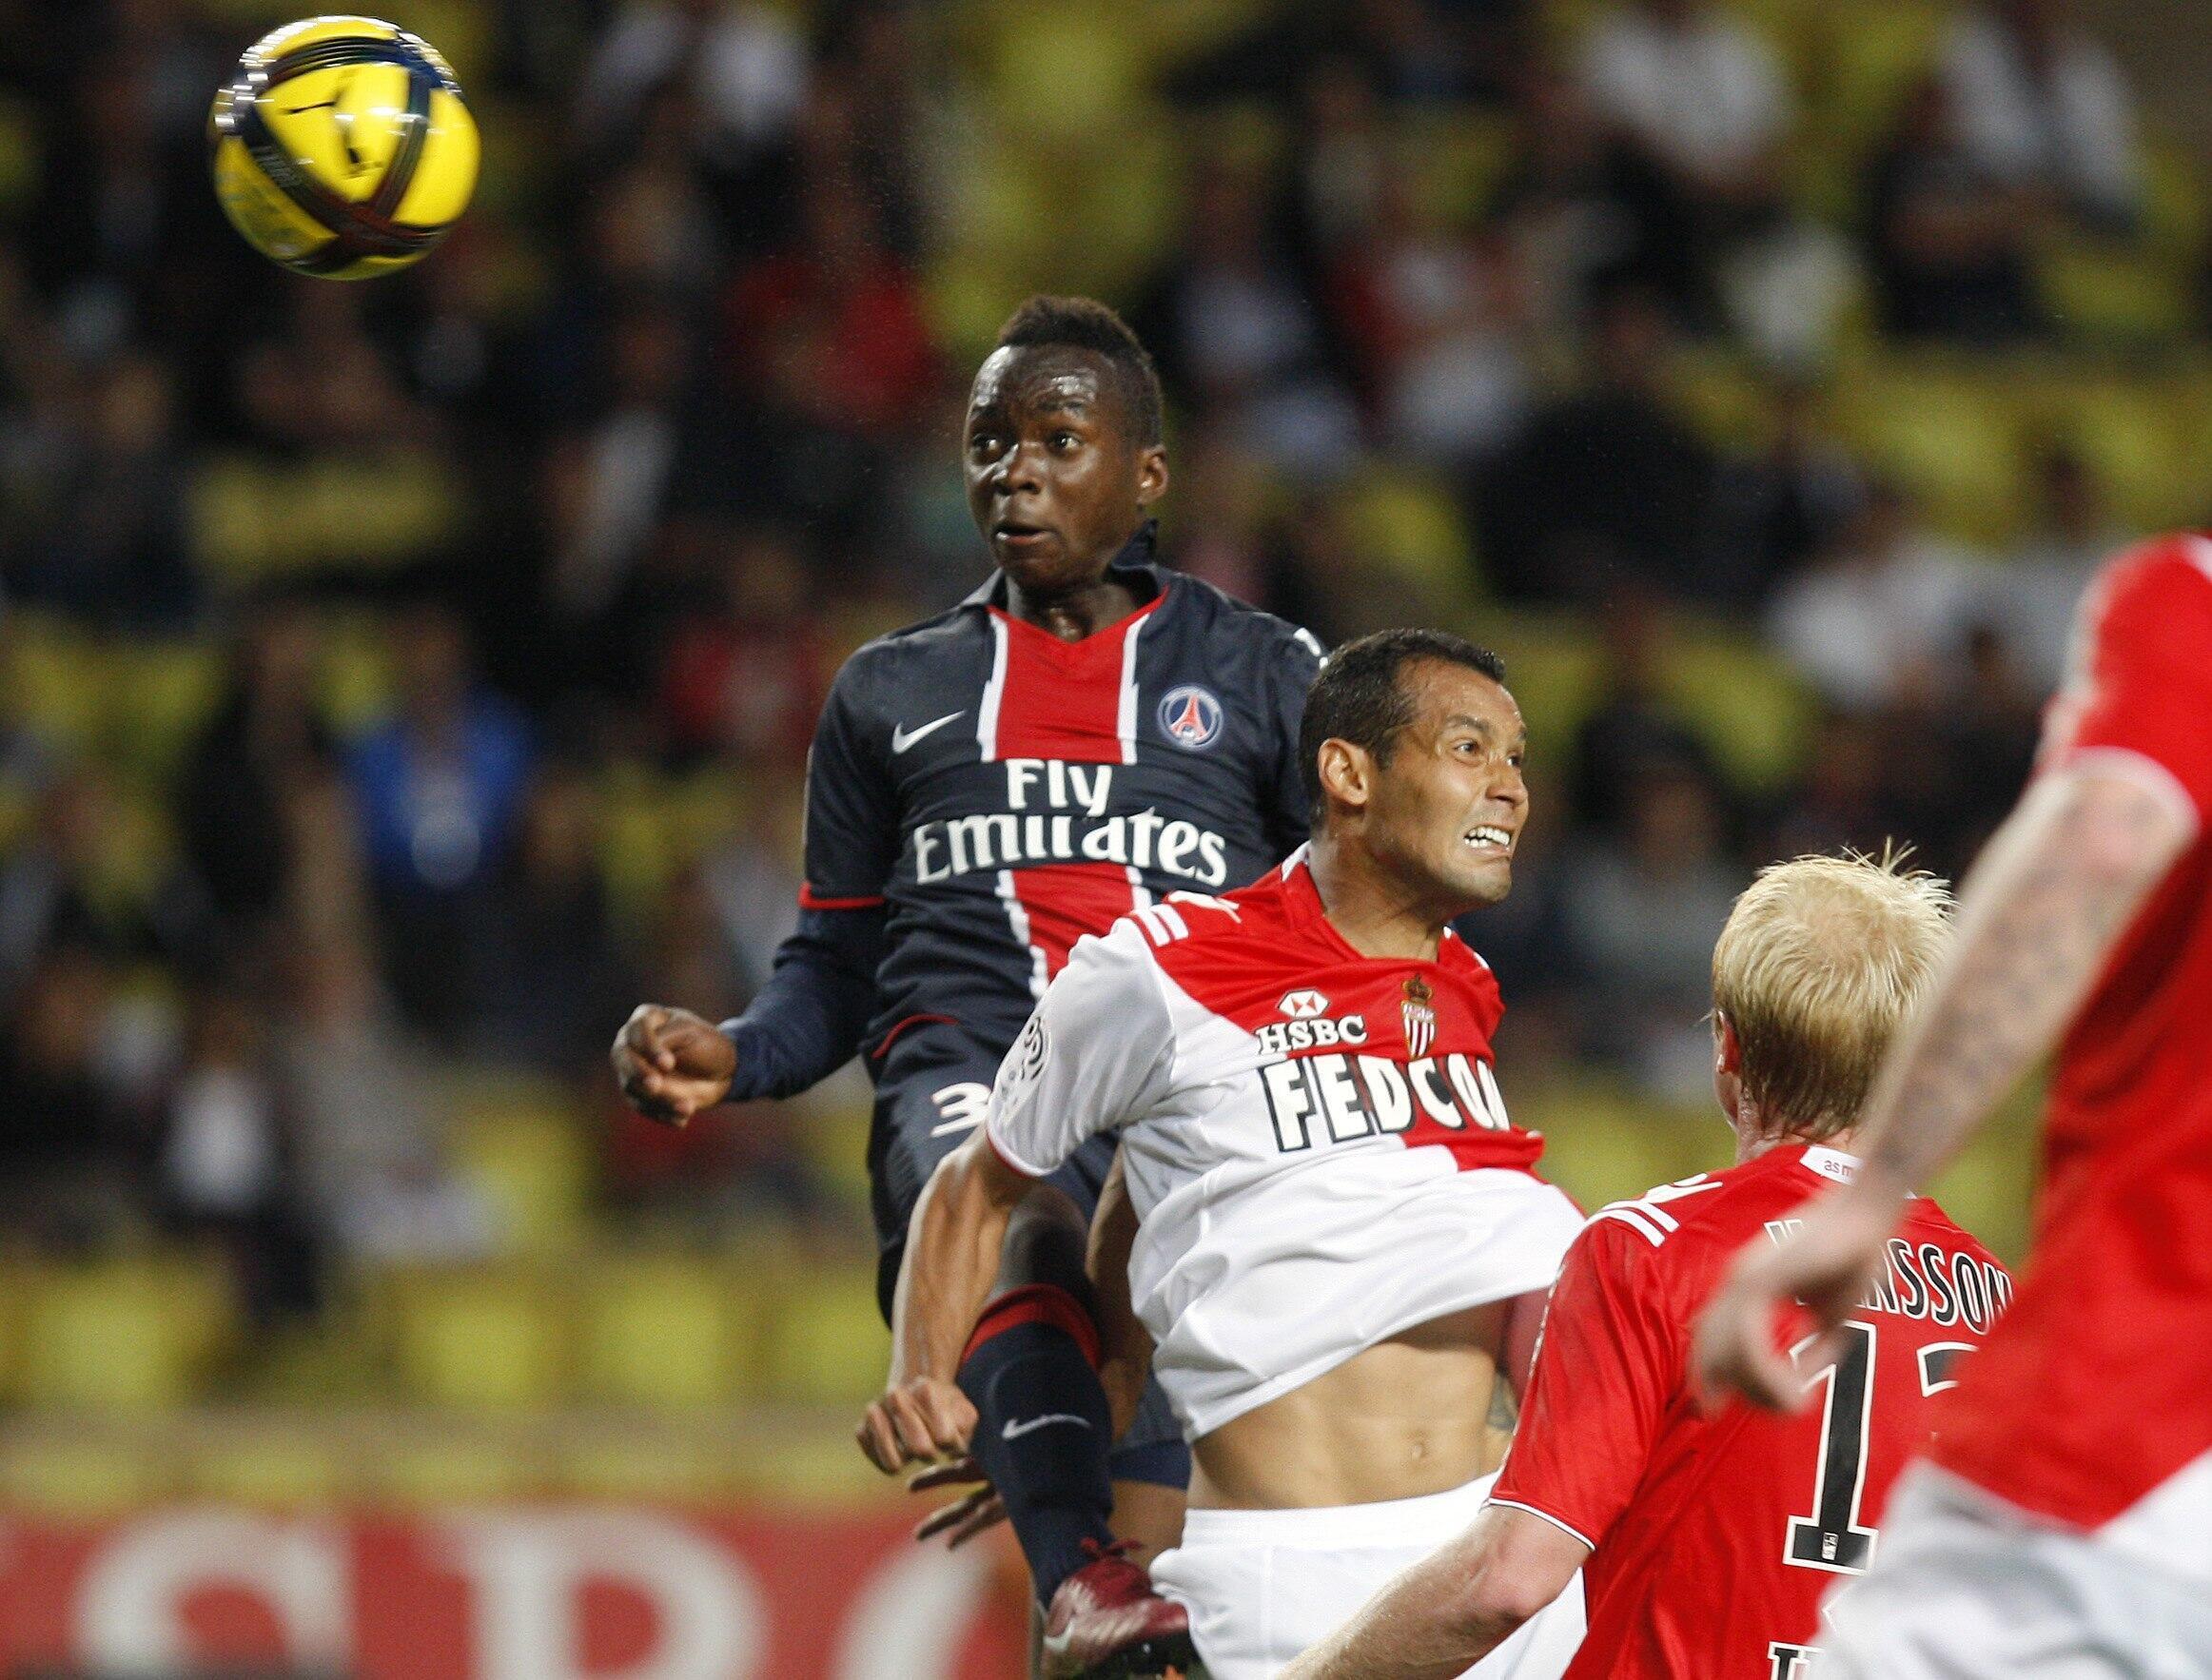 Neeskens Kebano sous les couleurs du PSG.